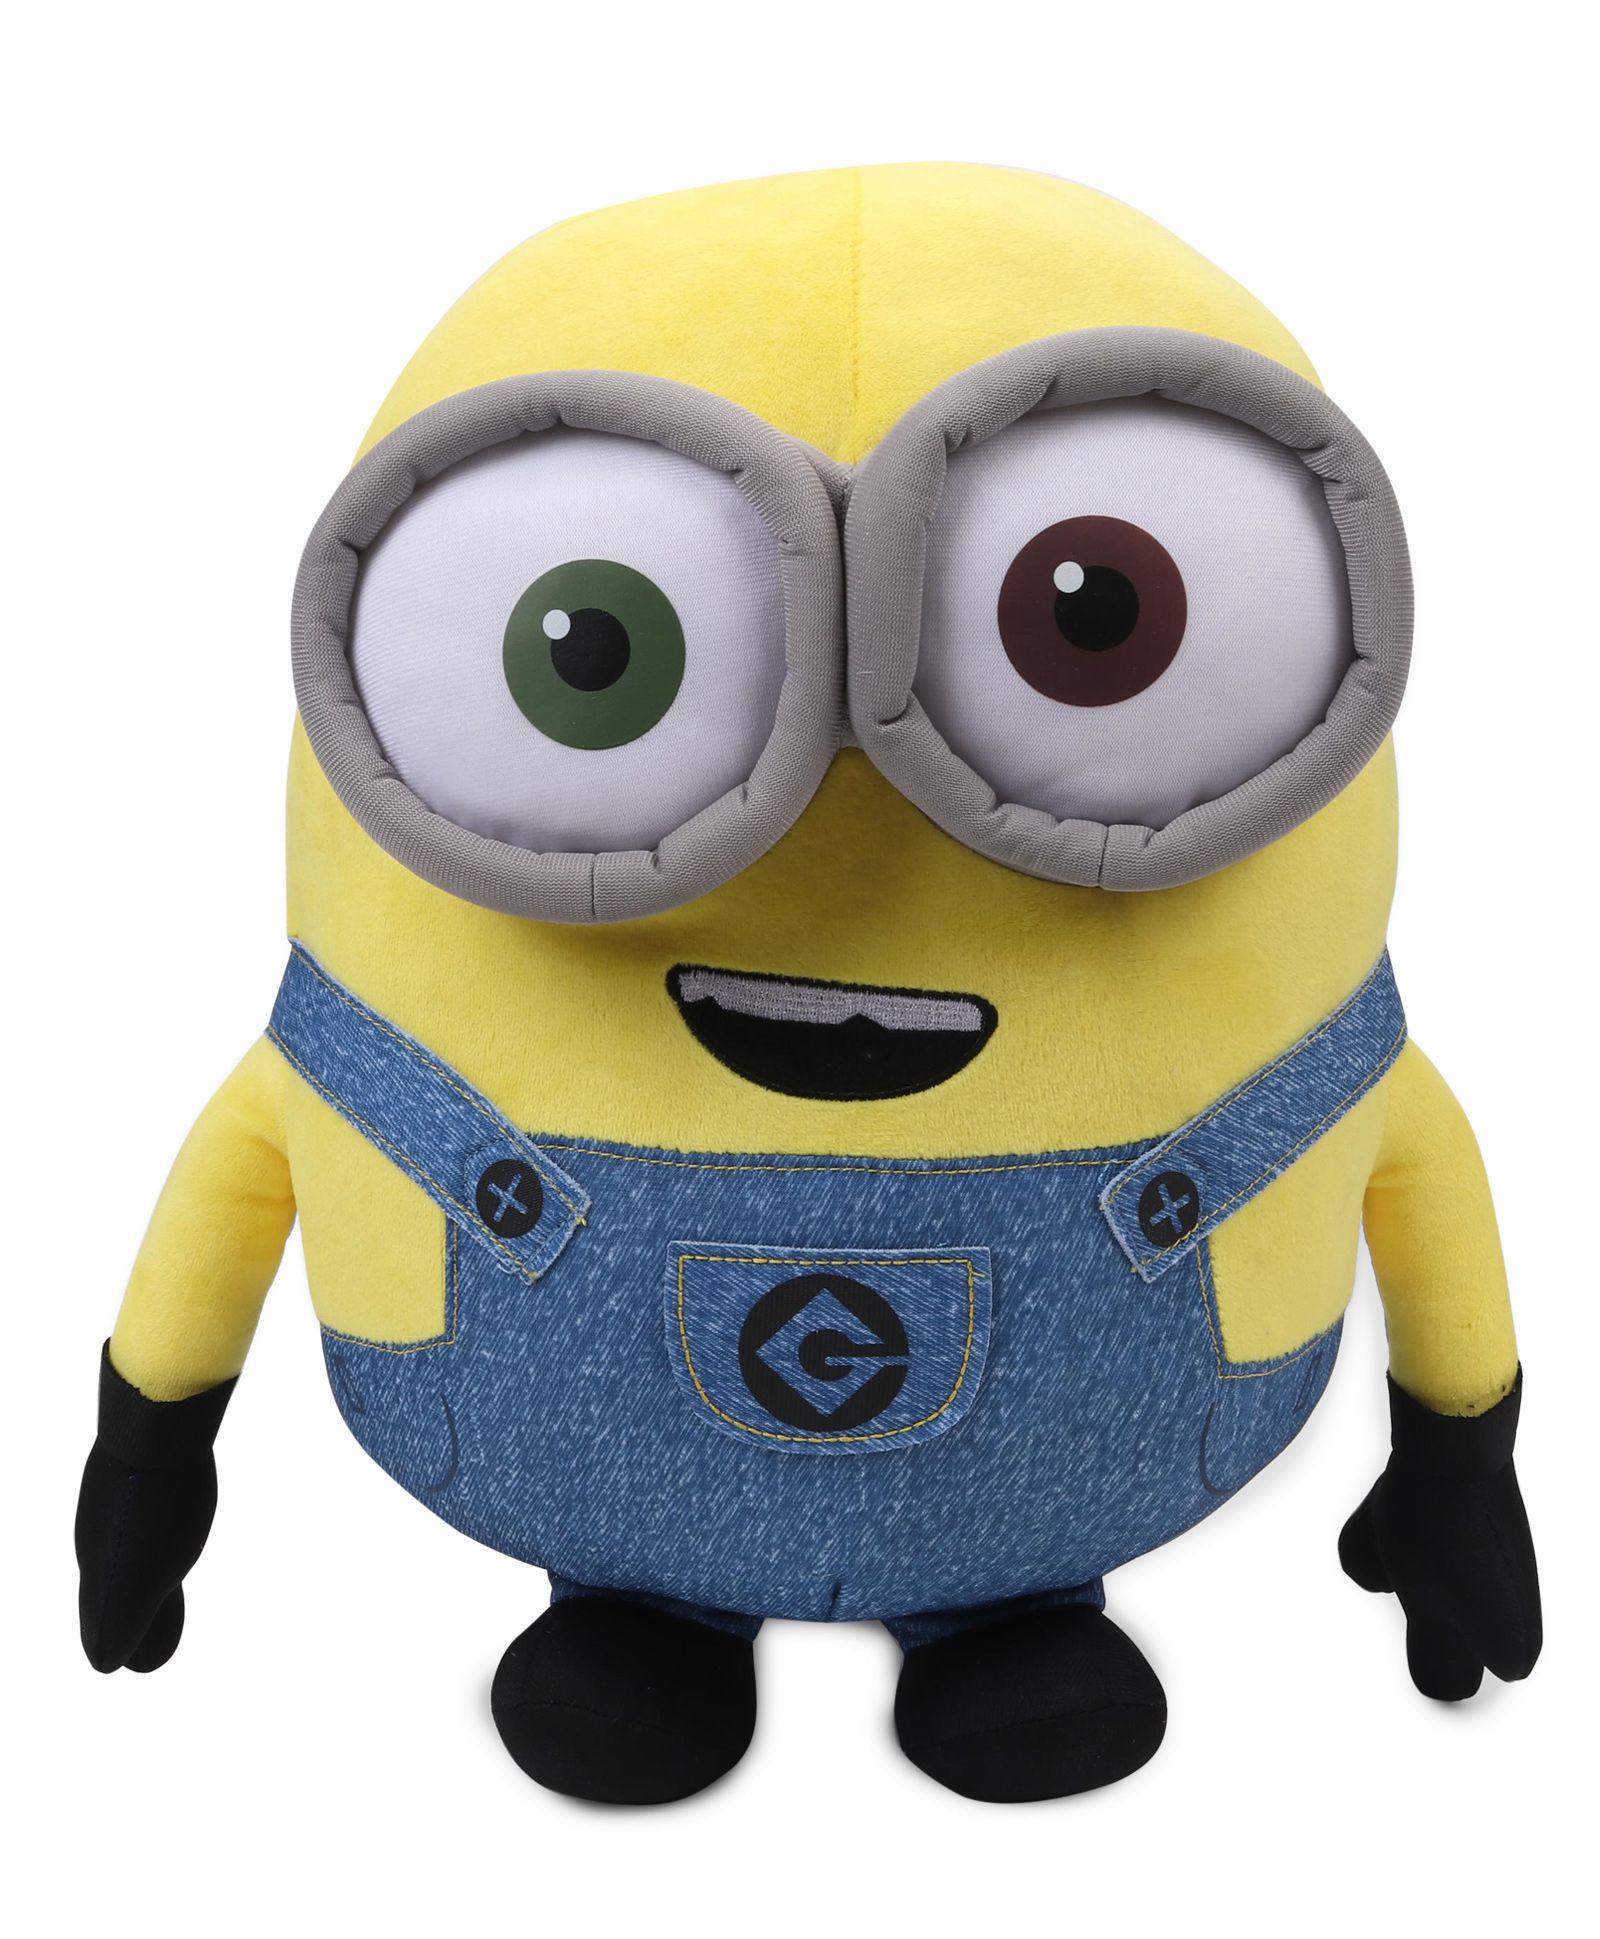 Sensational Minions Bob Plush Toy Blue Yellow Height 40 Cm Online India Bralicious Painted Fabric Chair Ideas Braliciousco